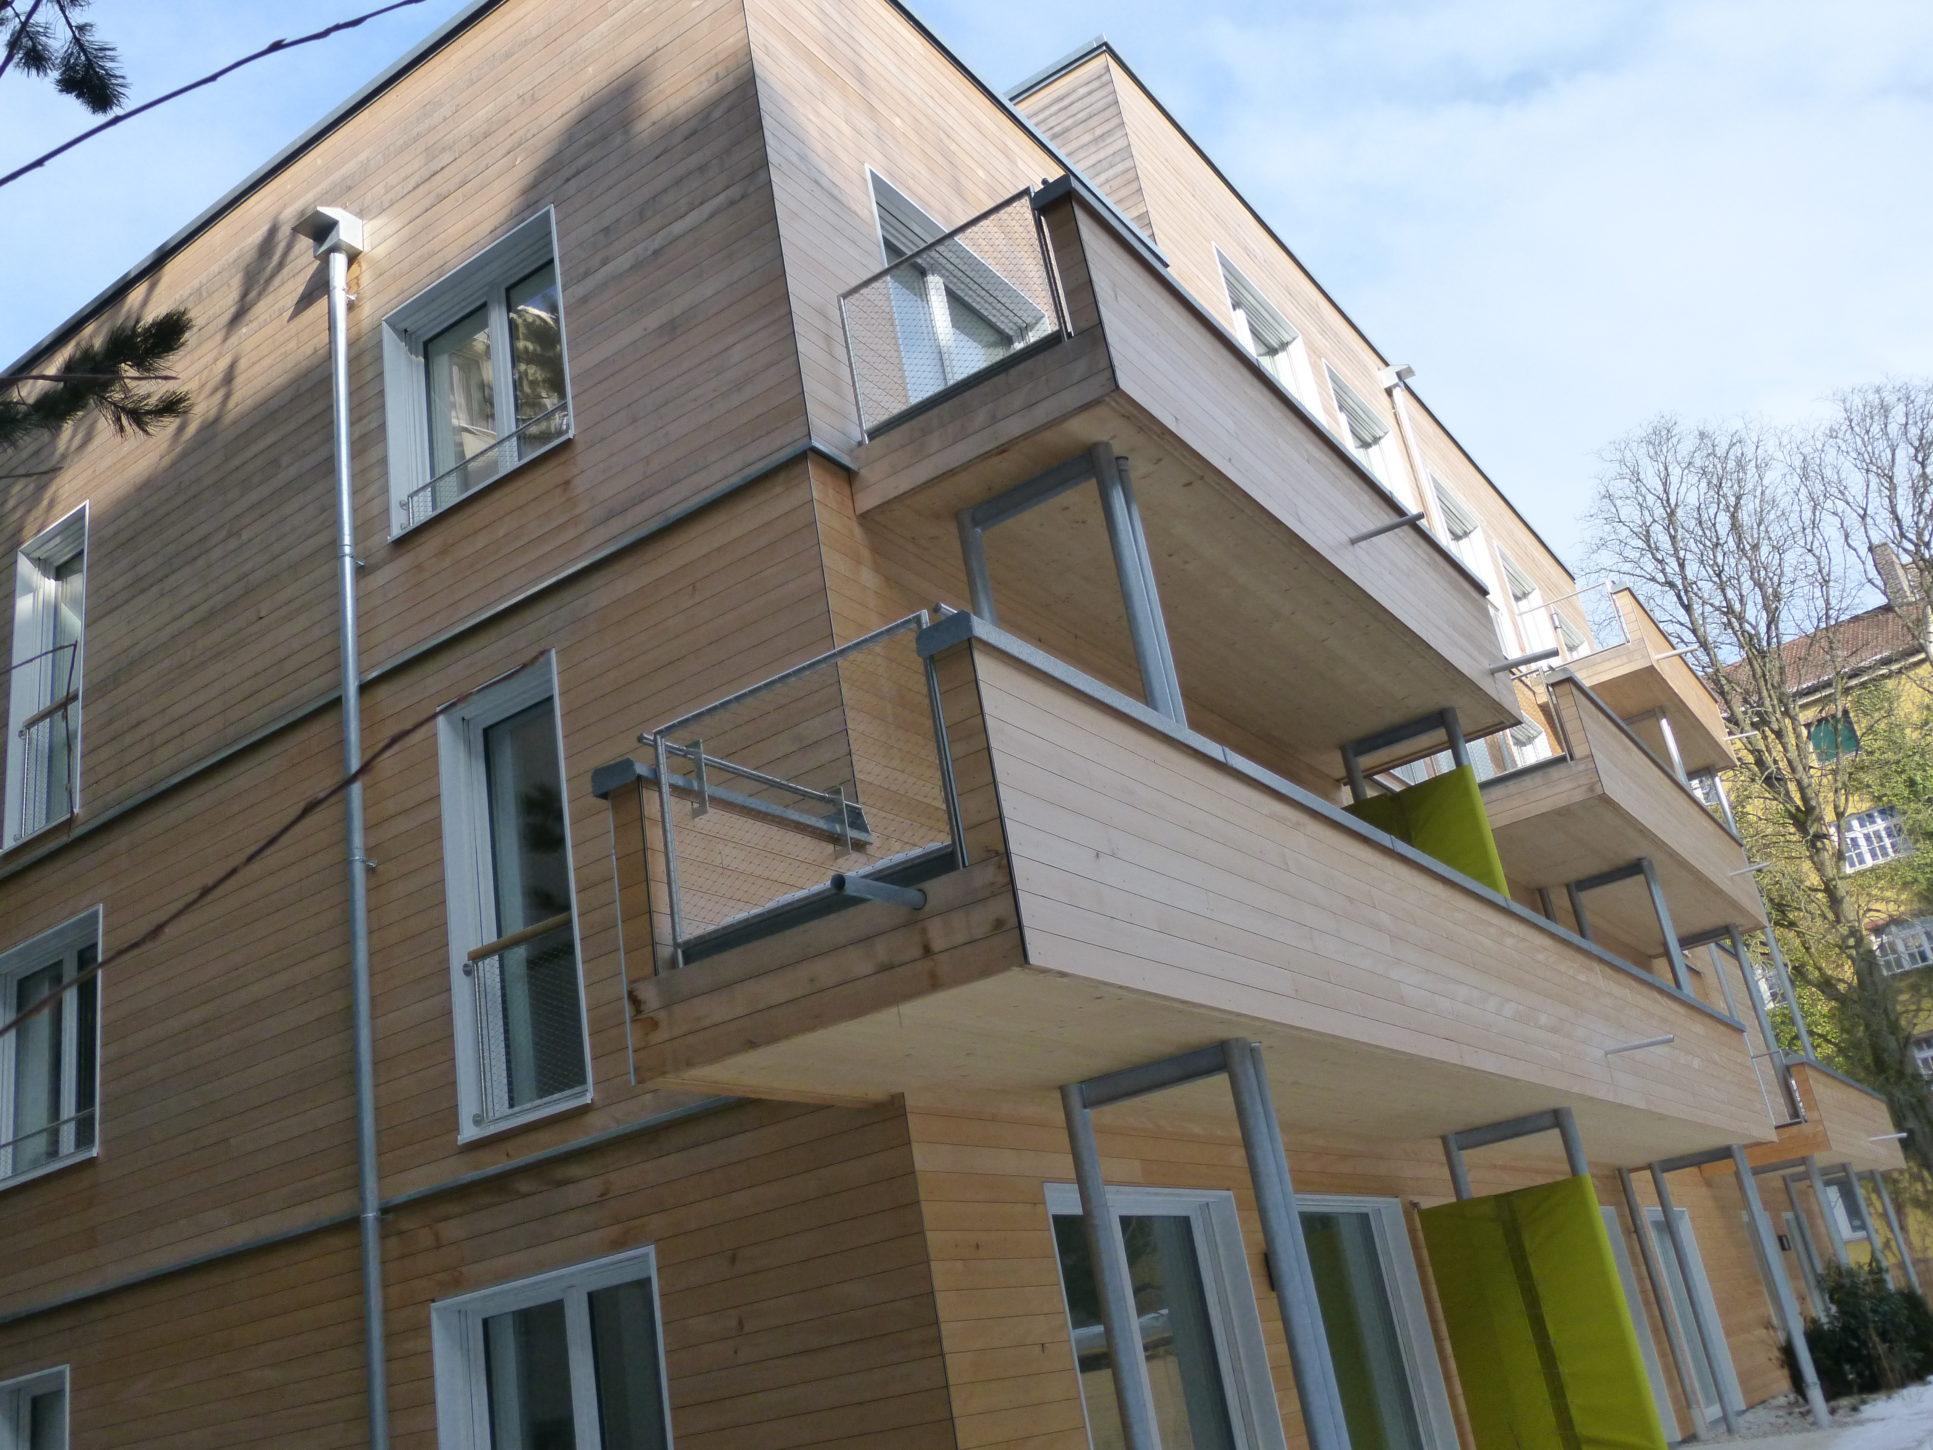 mehrgeschossiges bauen im urbanen raum in holzbauweise konstruktiver holzbau. Black Bedroom Furniture Sets. Home Design Ideas